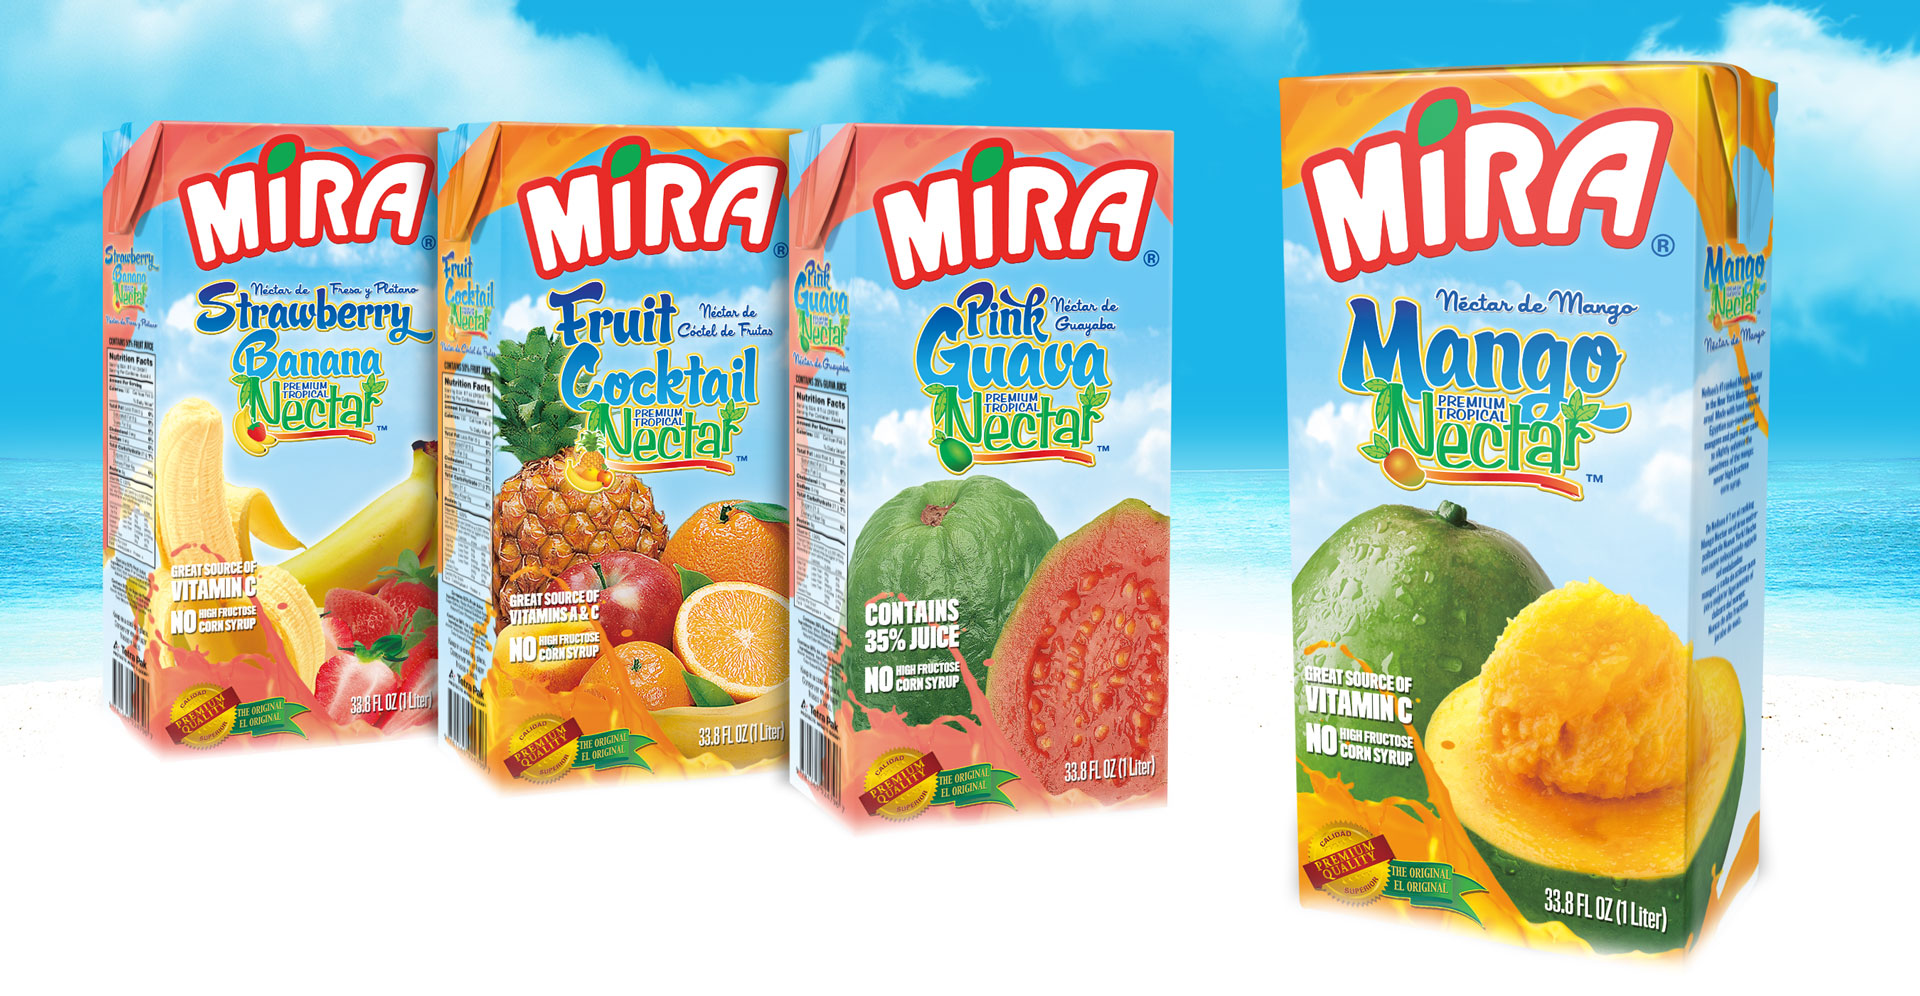 mira packaging